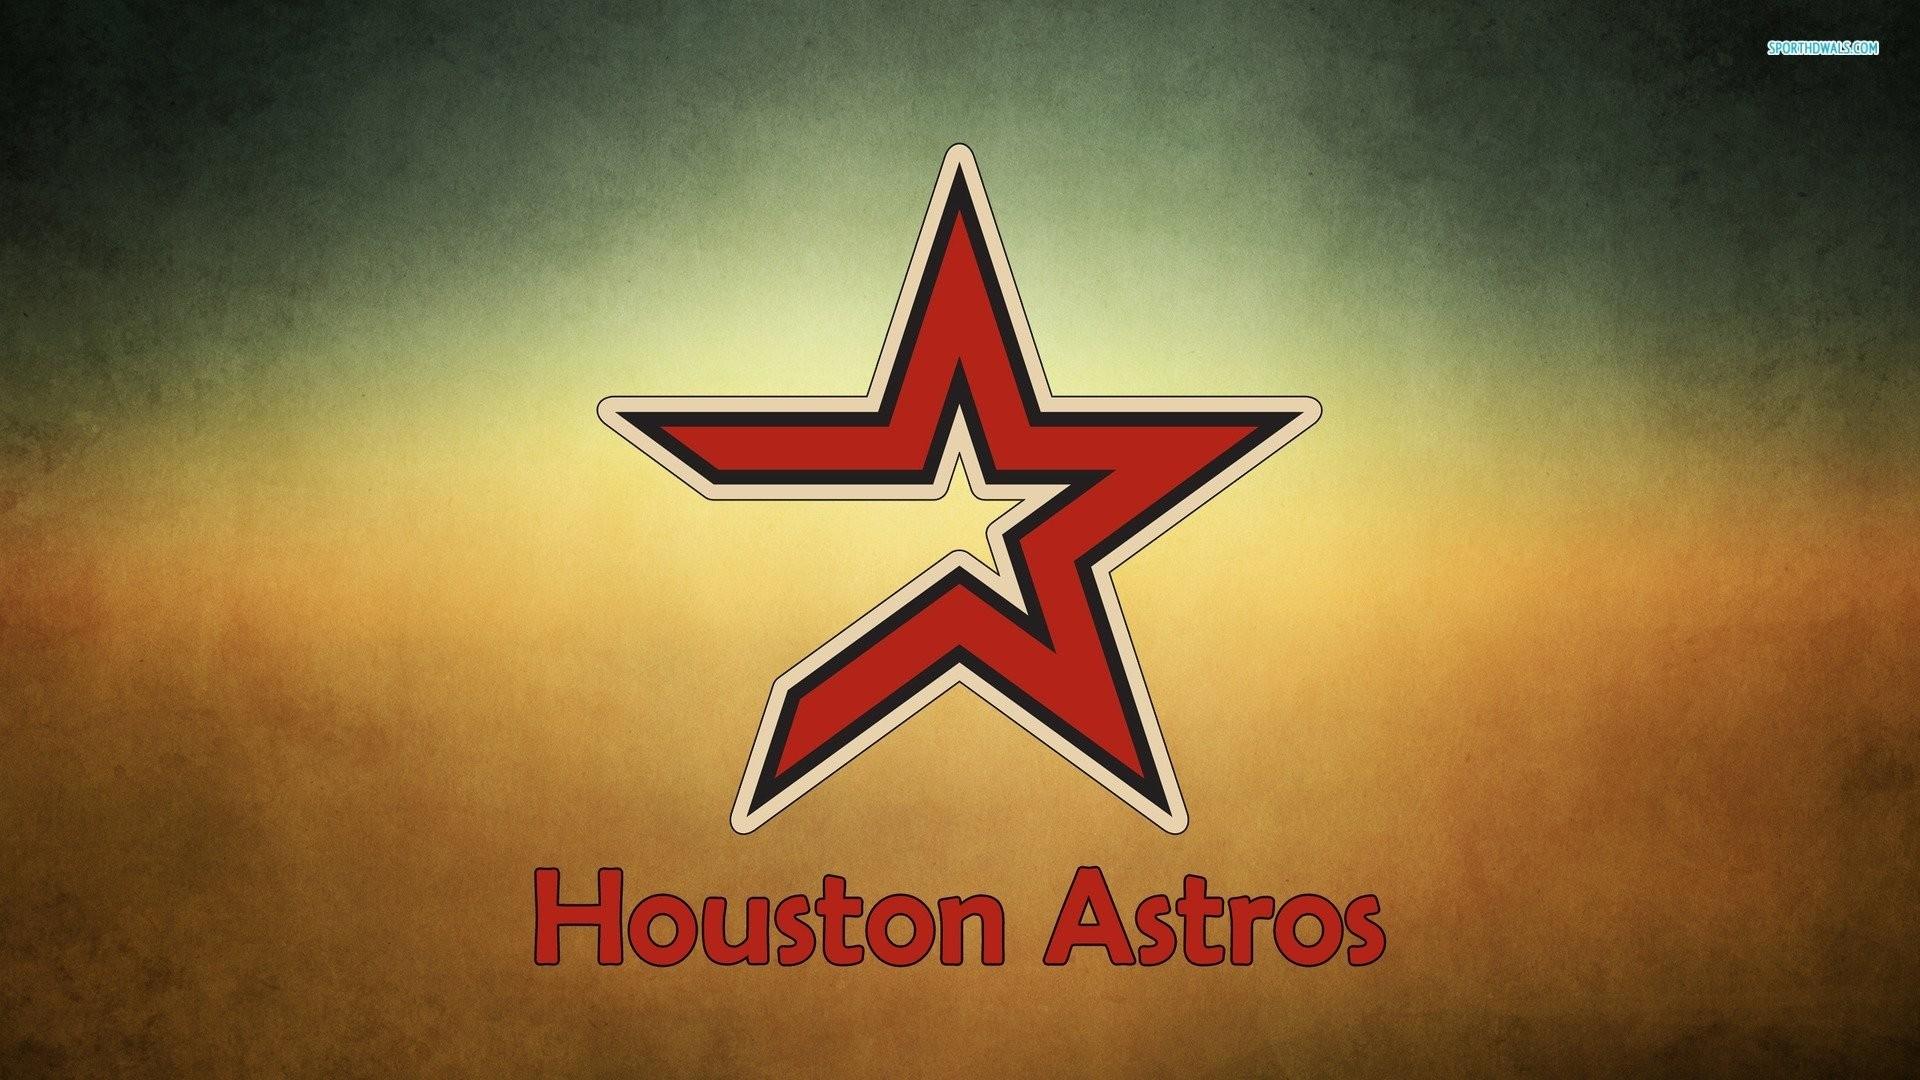 Houston Astros Background